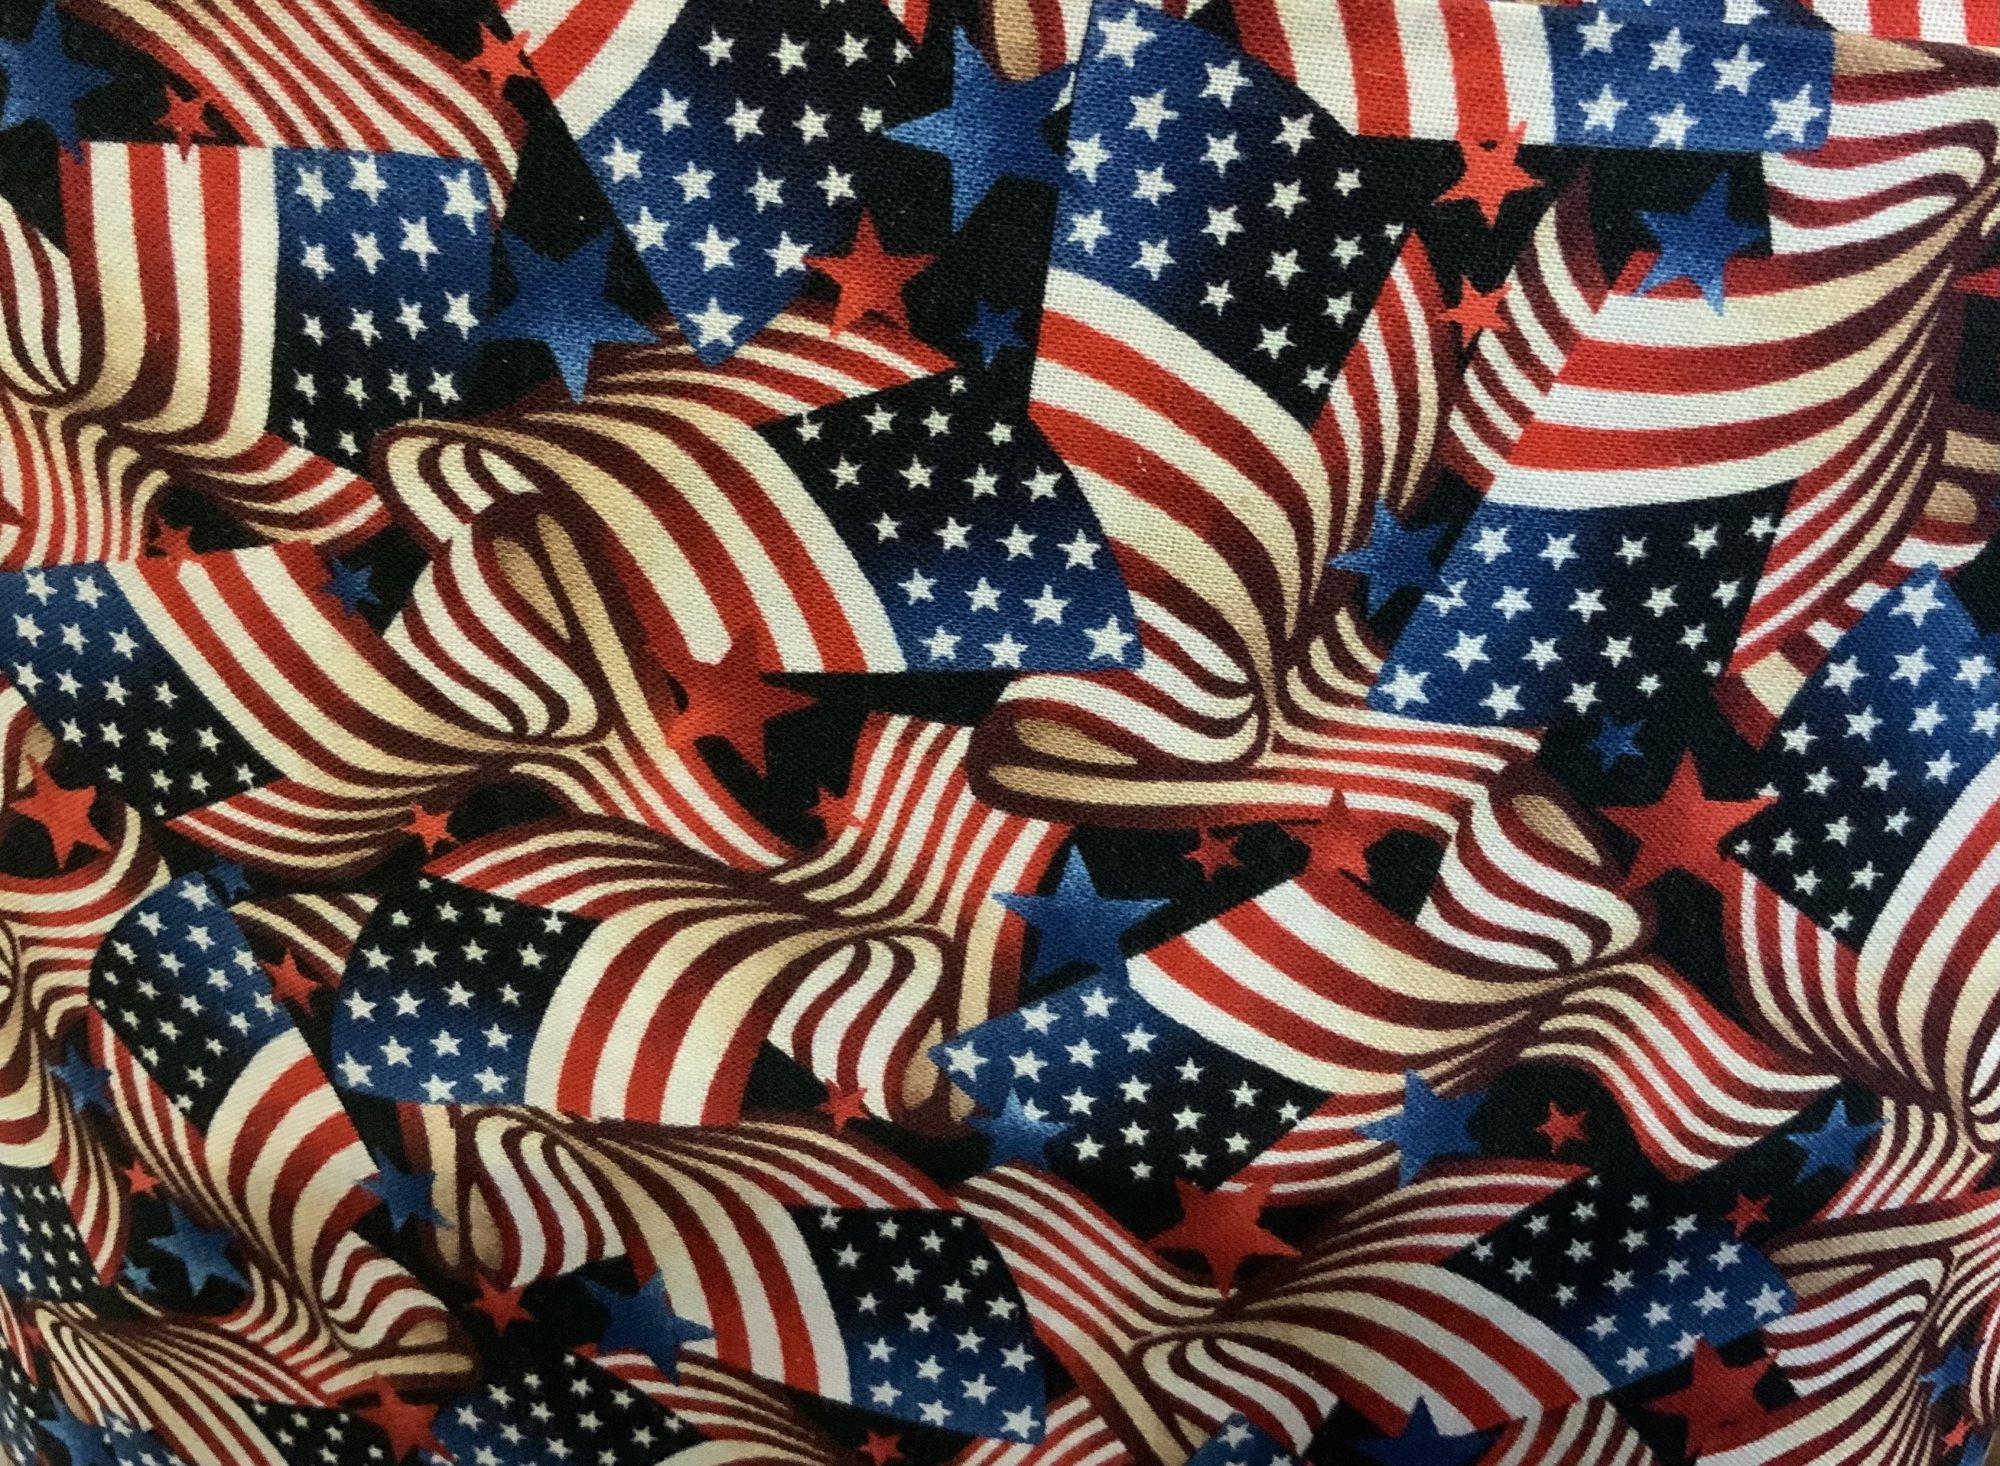 108 inch Starry Flag 5609-78 - Studio E Fabrics